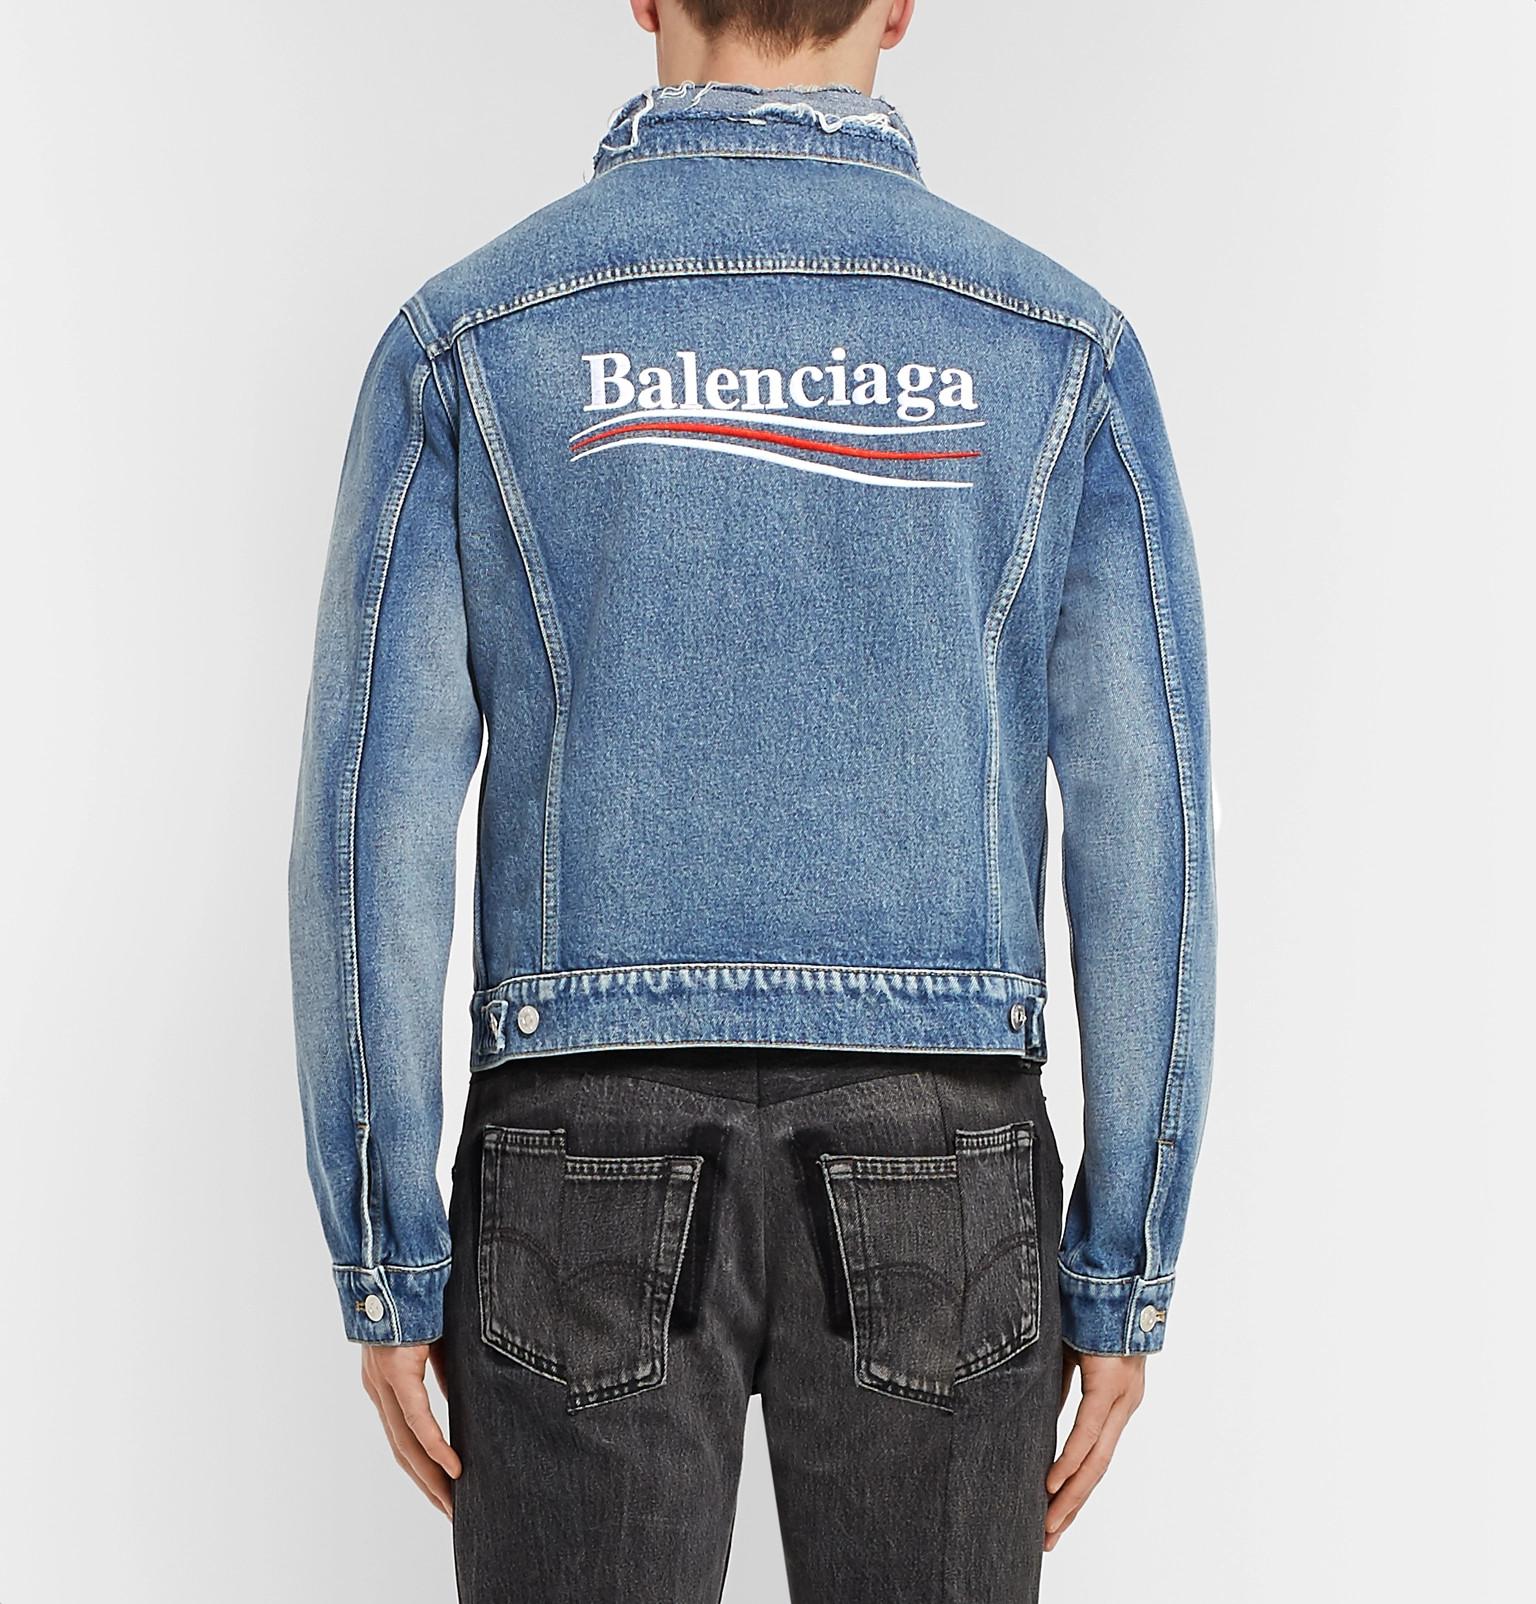 e1c77de626f2 Balenciaga - Cropped Embroidered Distressed Denim Jacket